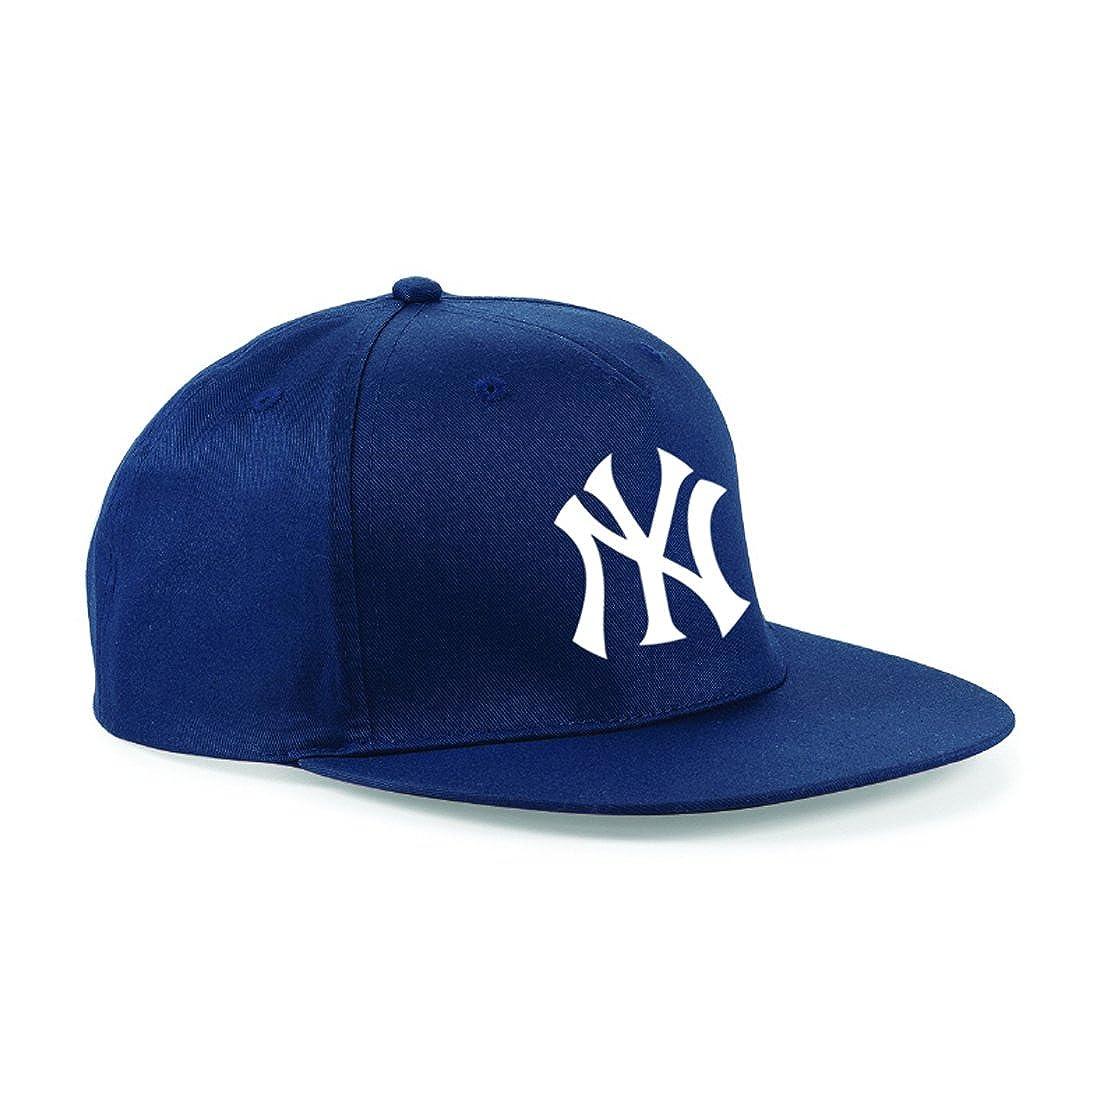 NY New York Cool Retro Boys Hat/Cap White Print Black One Sze